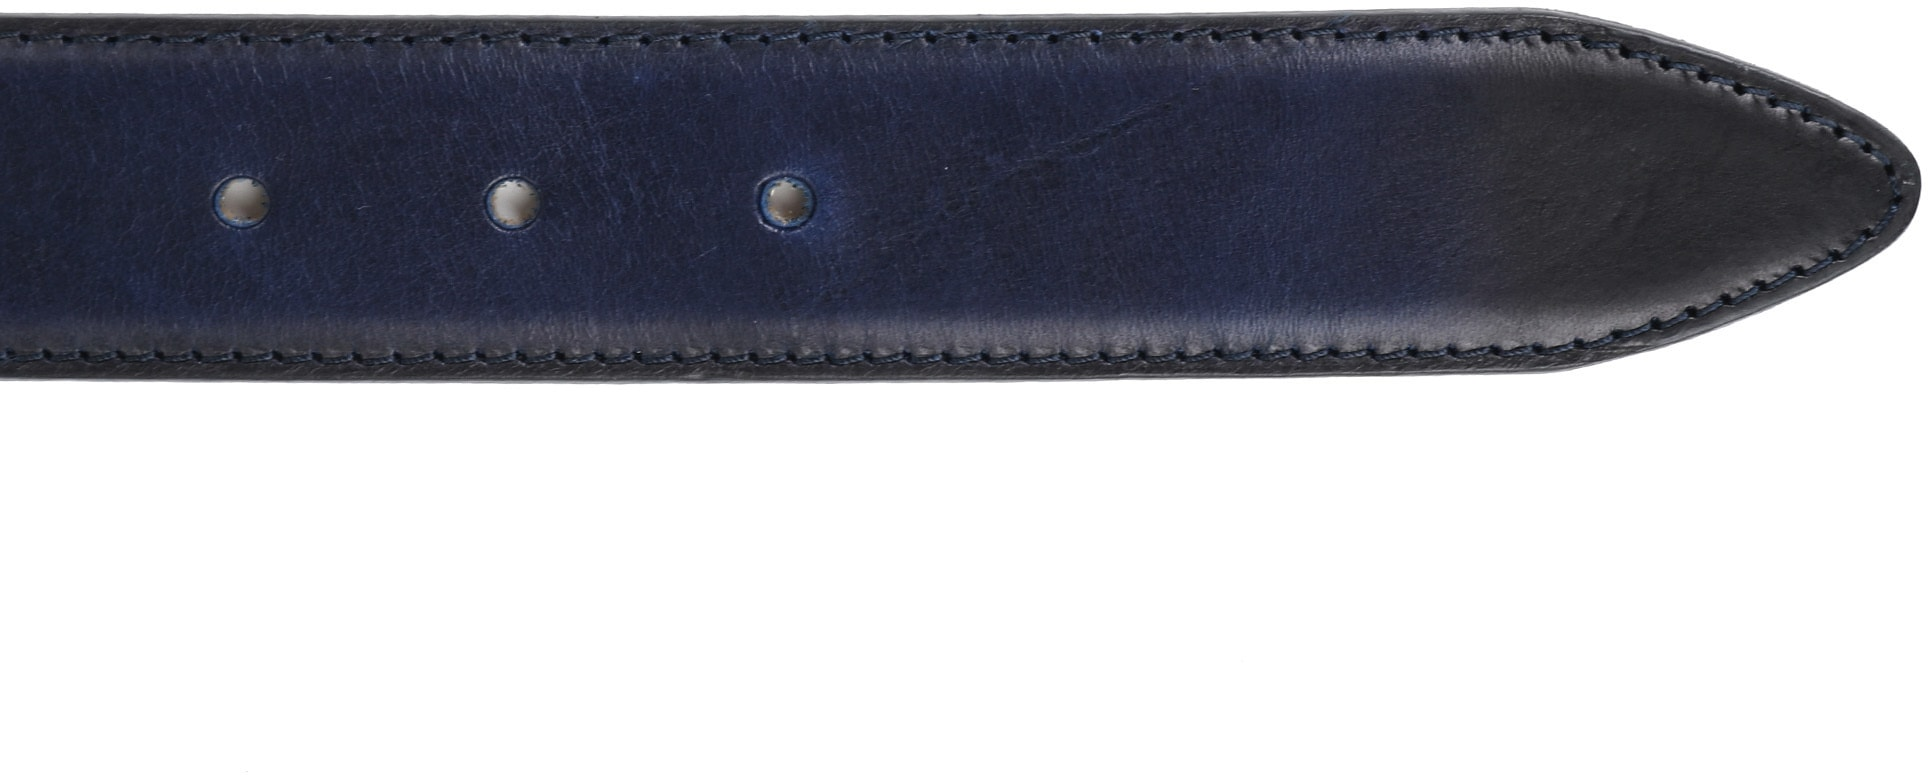 Profuomo Leather Navy Belt  photo 2